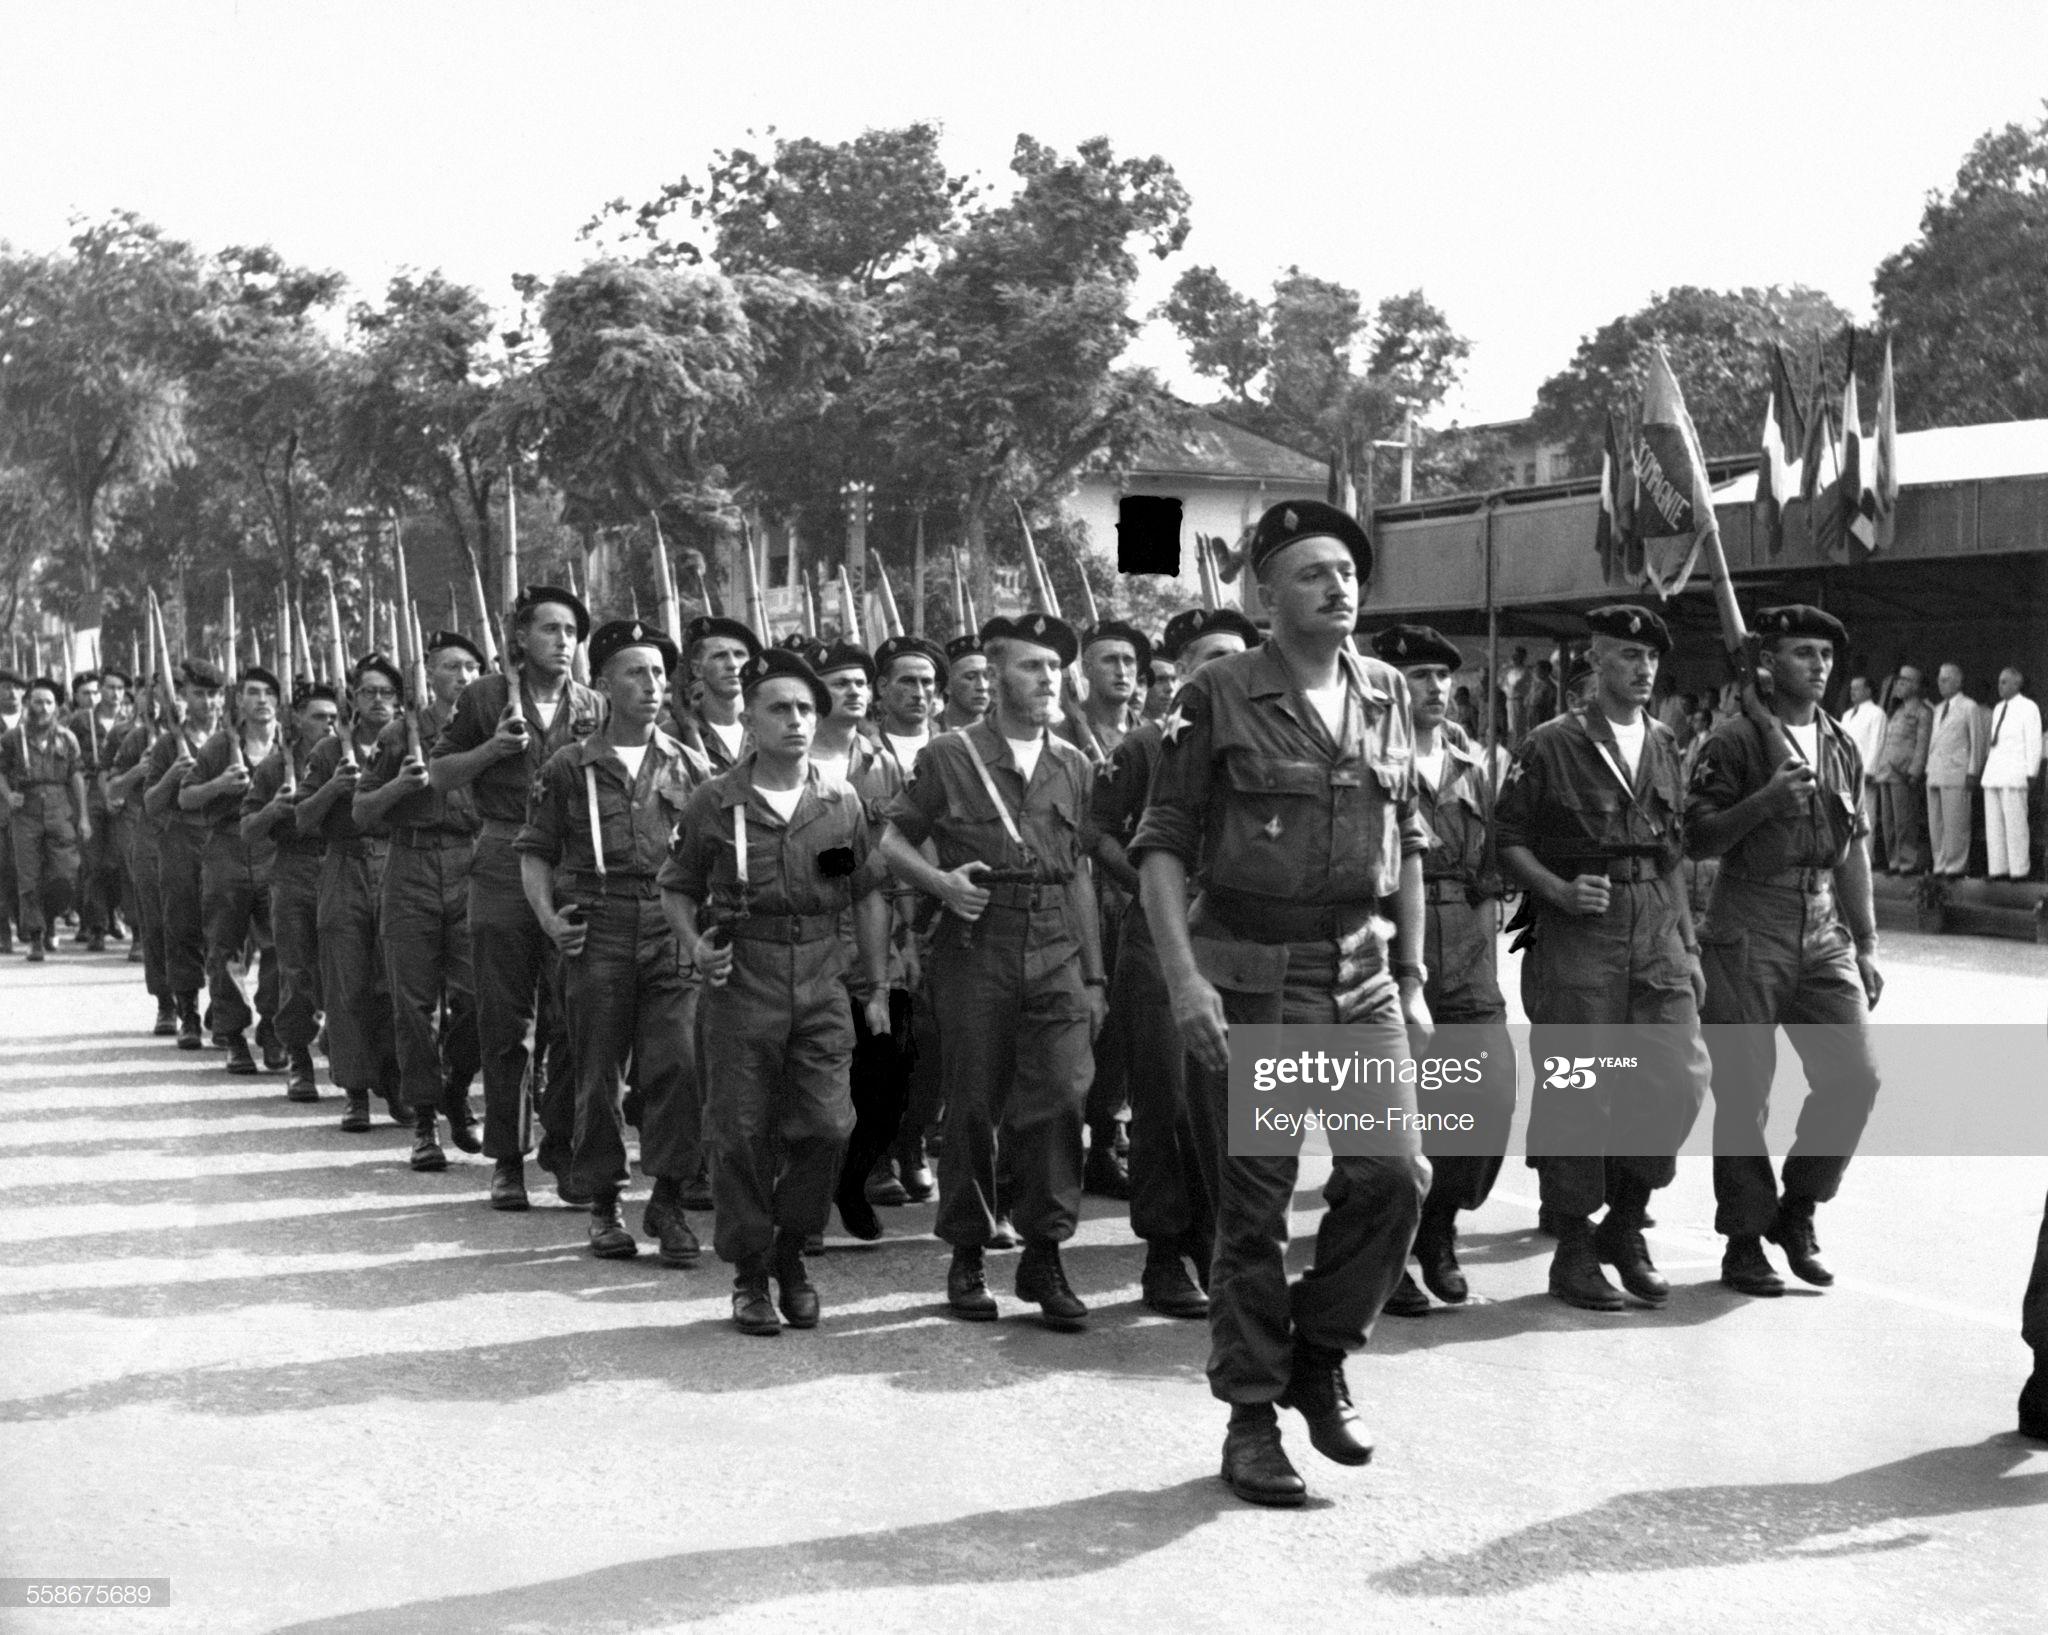 Фр батальон из Кореи в Сайгоне 3 нояб 1953.jpg